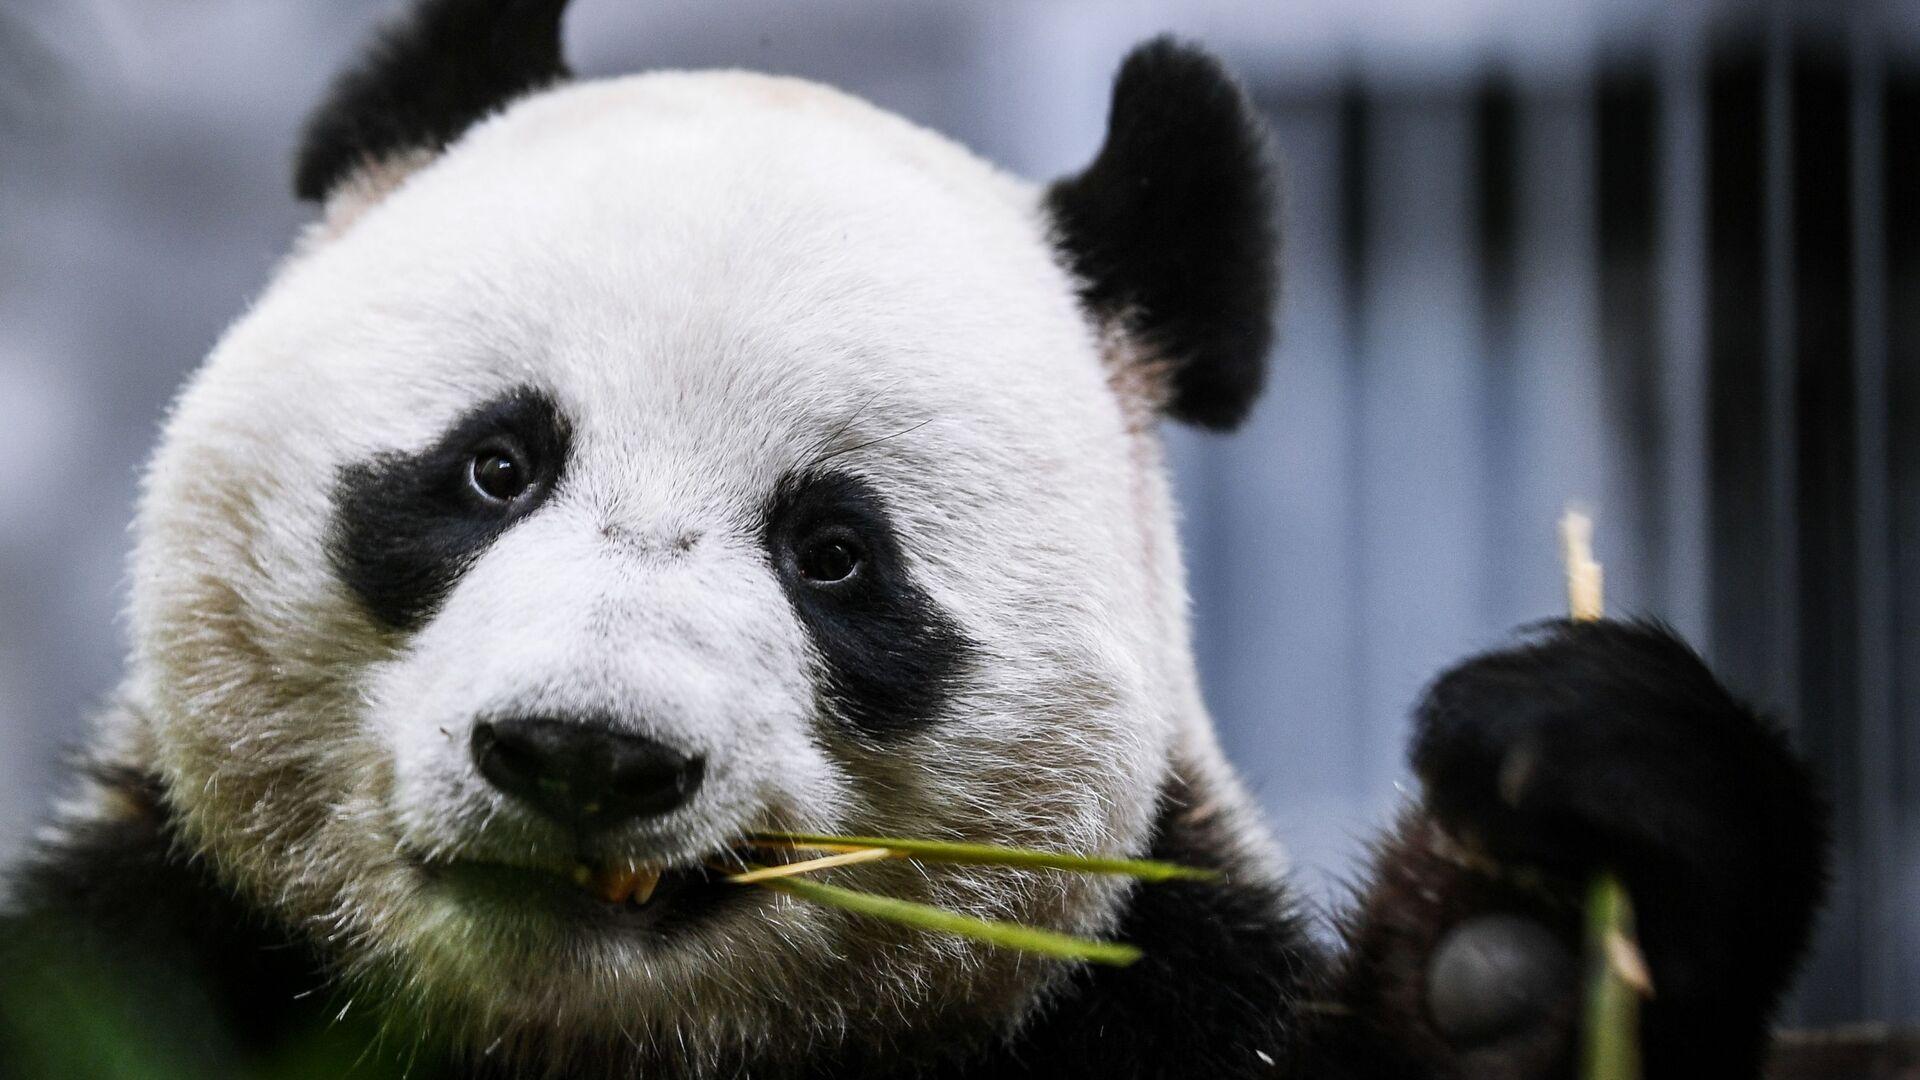 Panda Ru Yi dello zoo di Mosca - Sputnik Italia, 1920, 09.07.2021